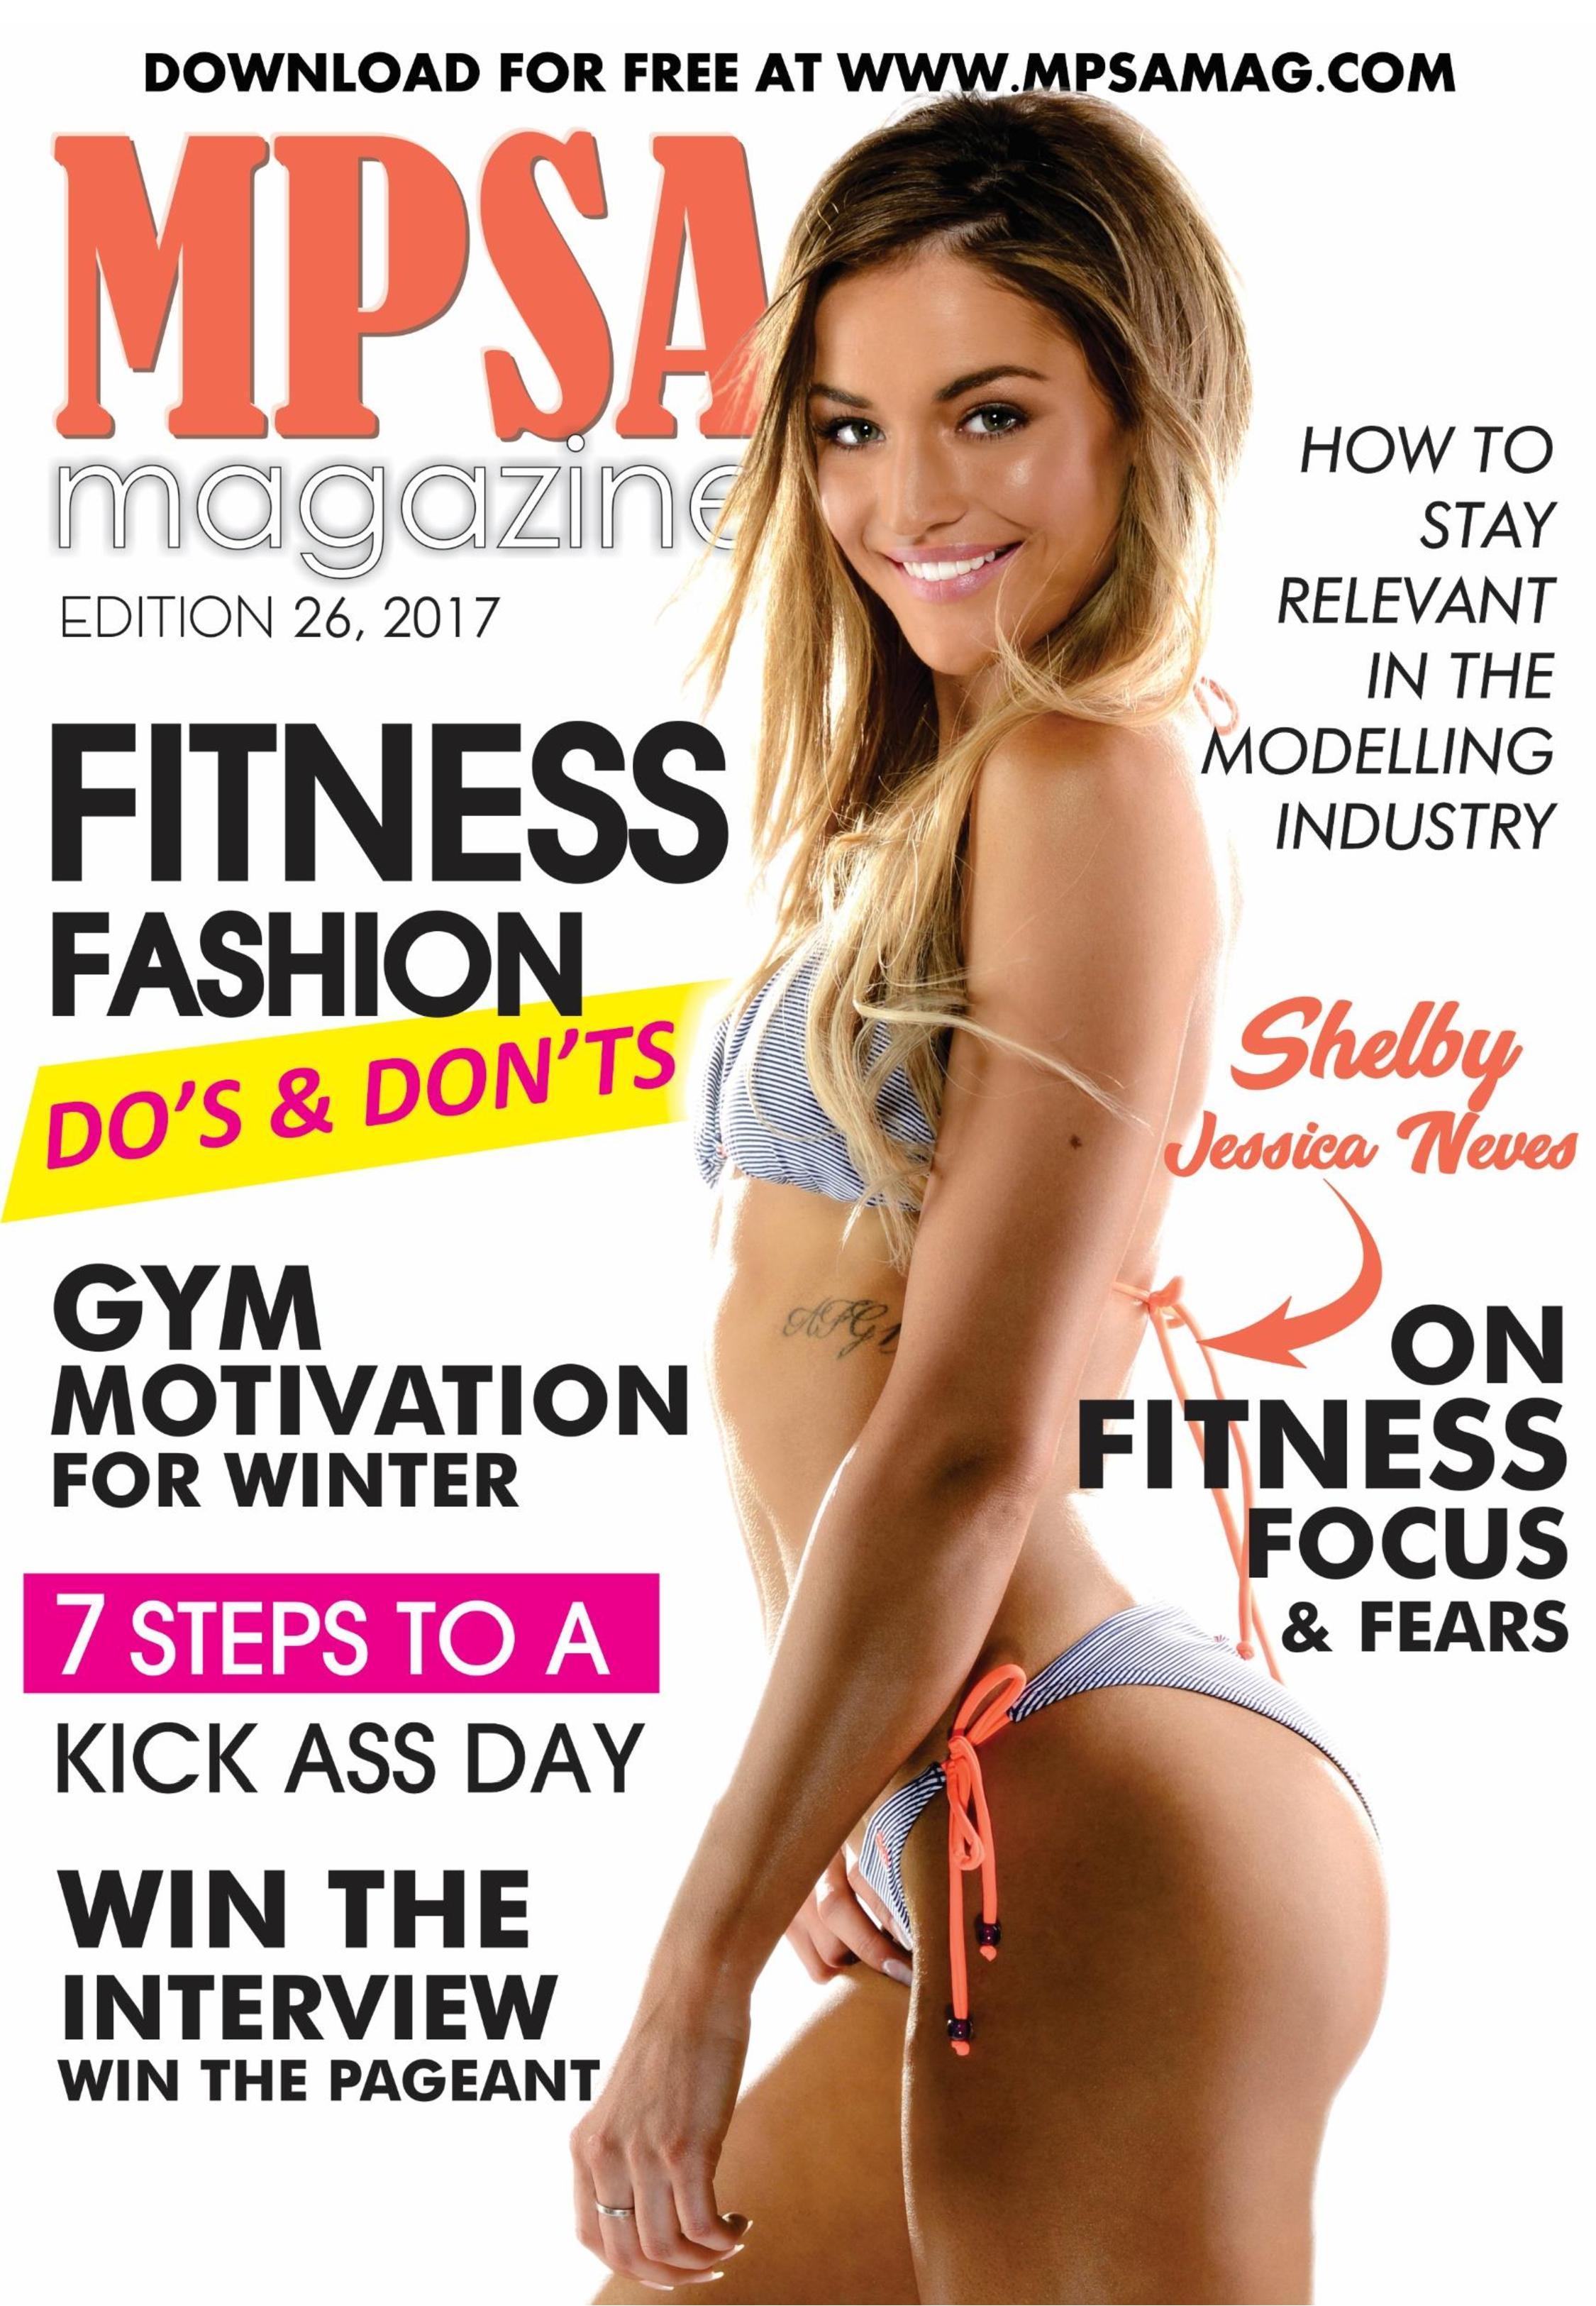 MPSA-Cover-page